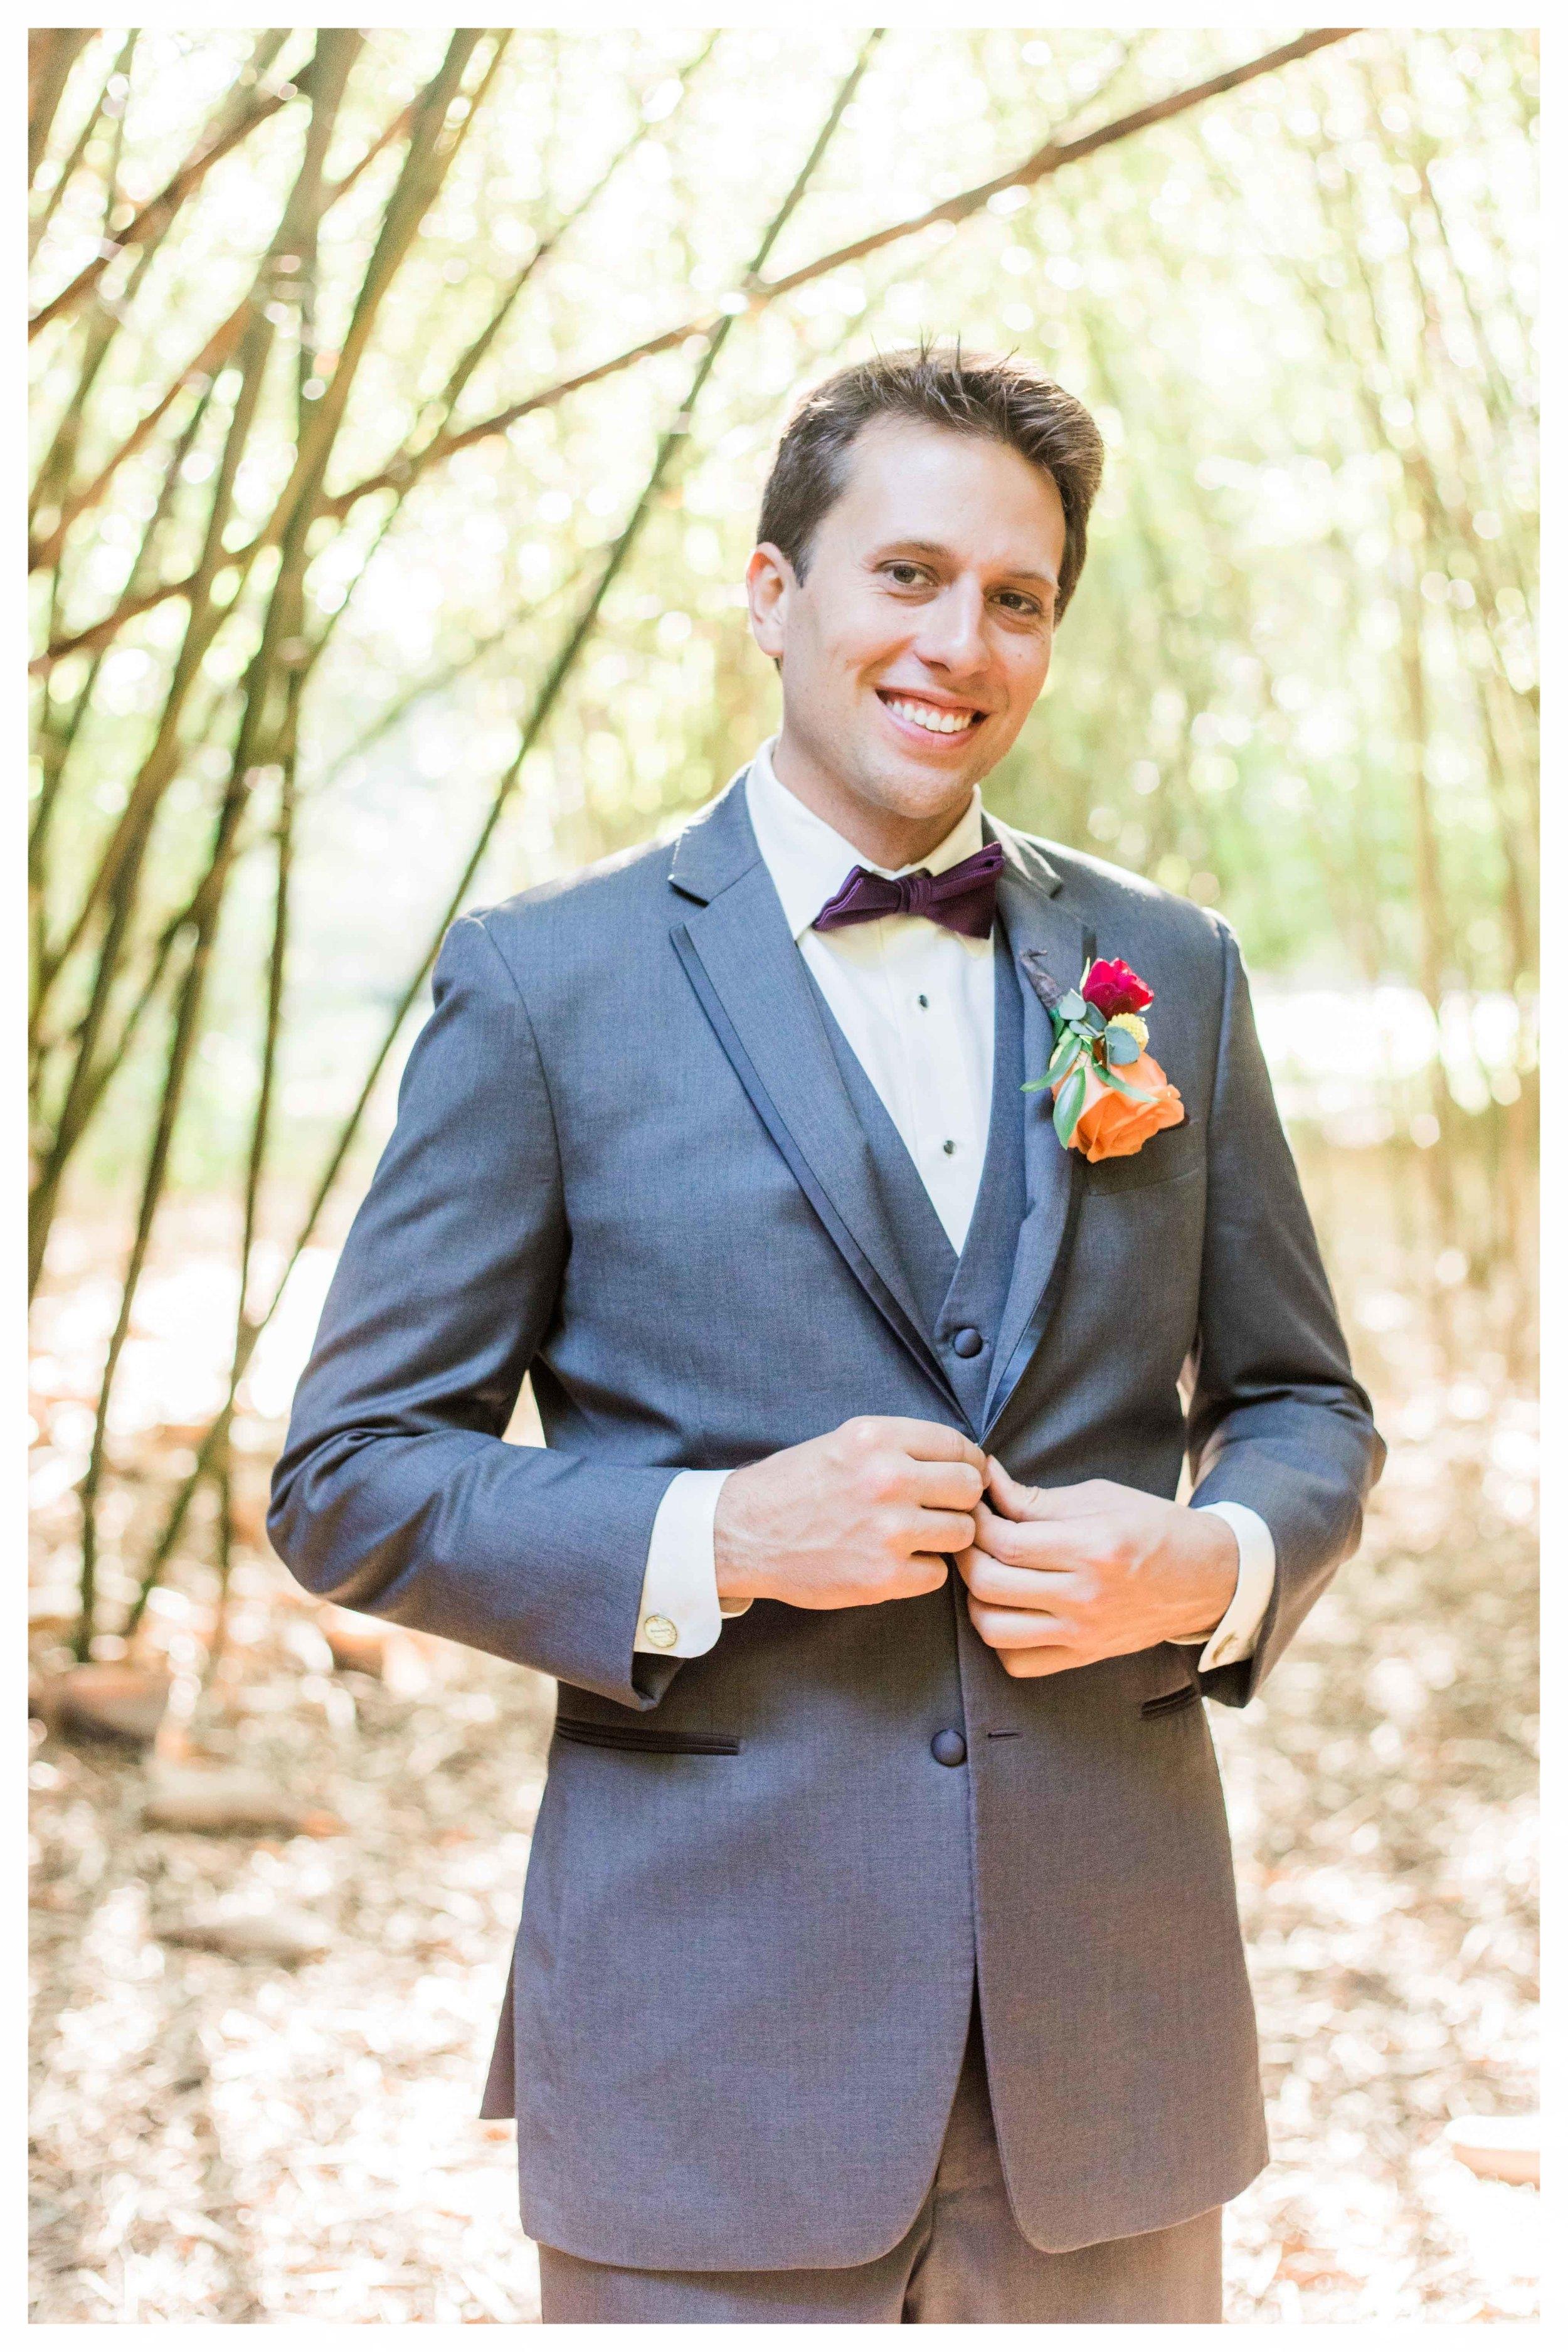 gunn_pre_wedding_first_look (209 of 231).jpg